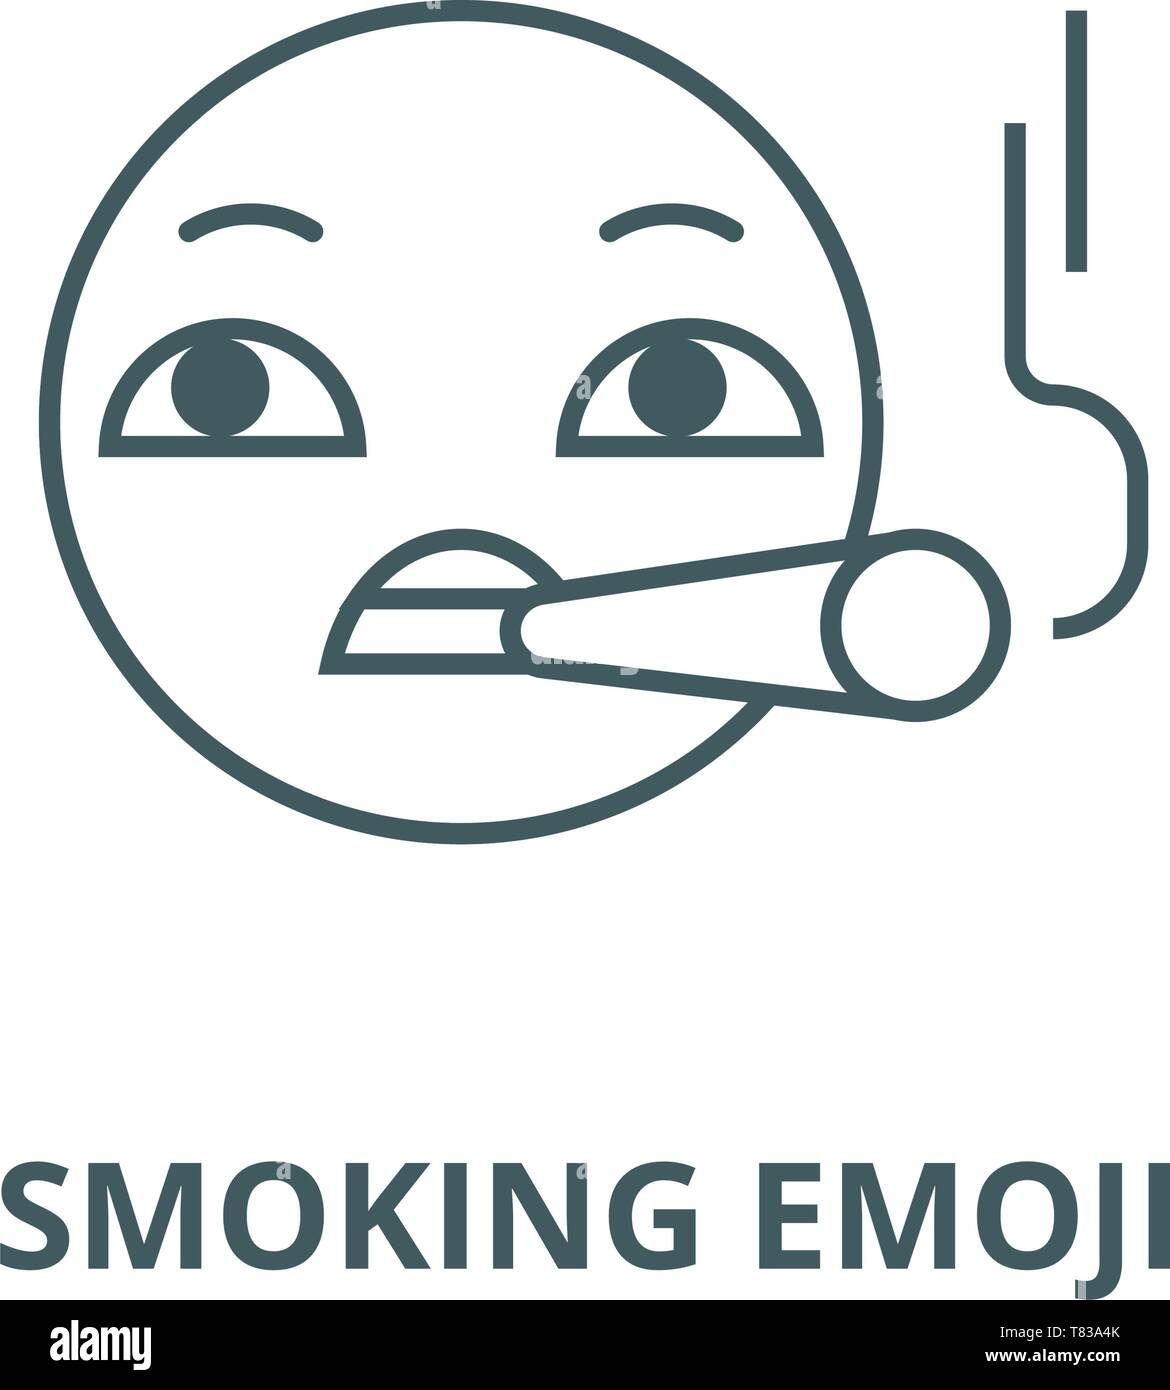 Smoking Smiley Stock Photos & Smoking Smiley Stock Images